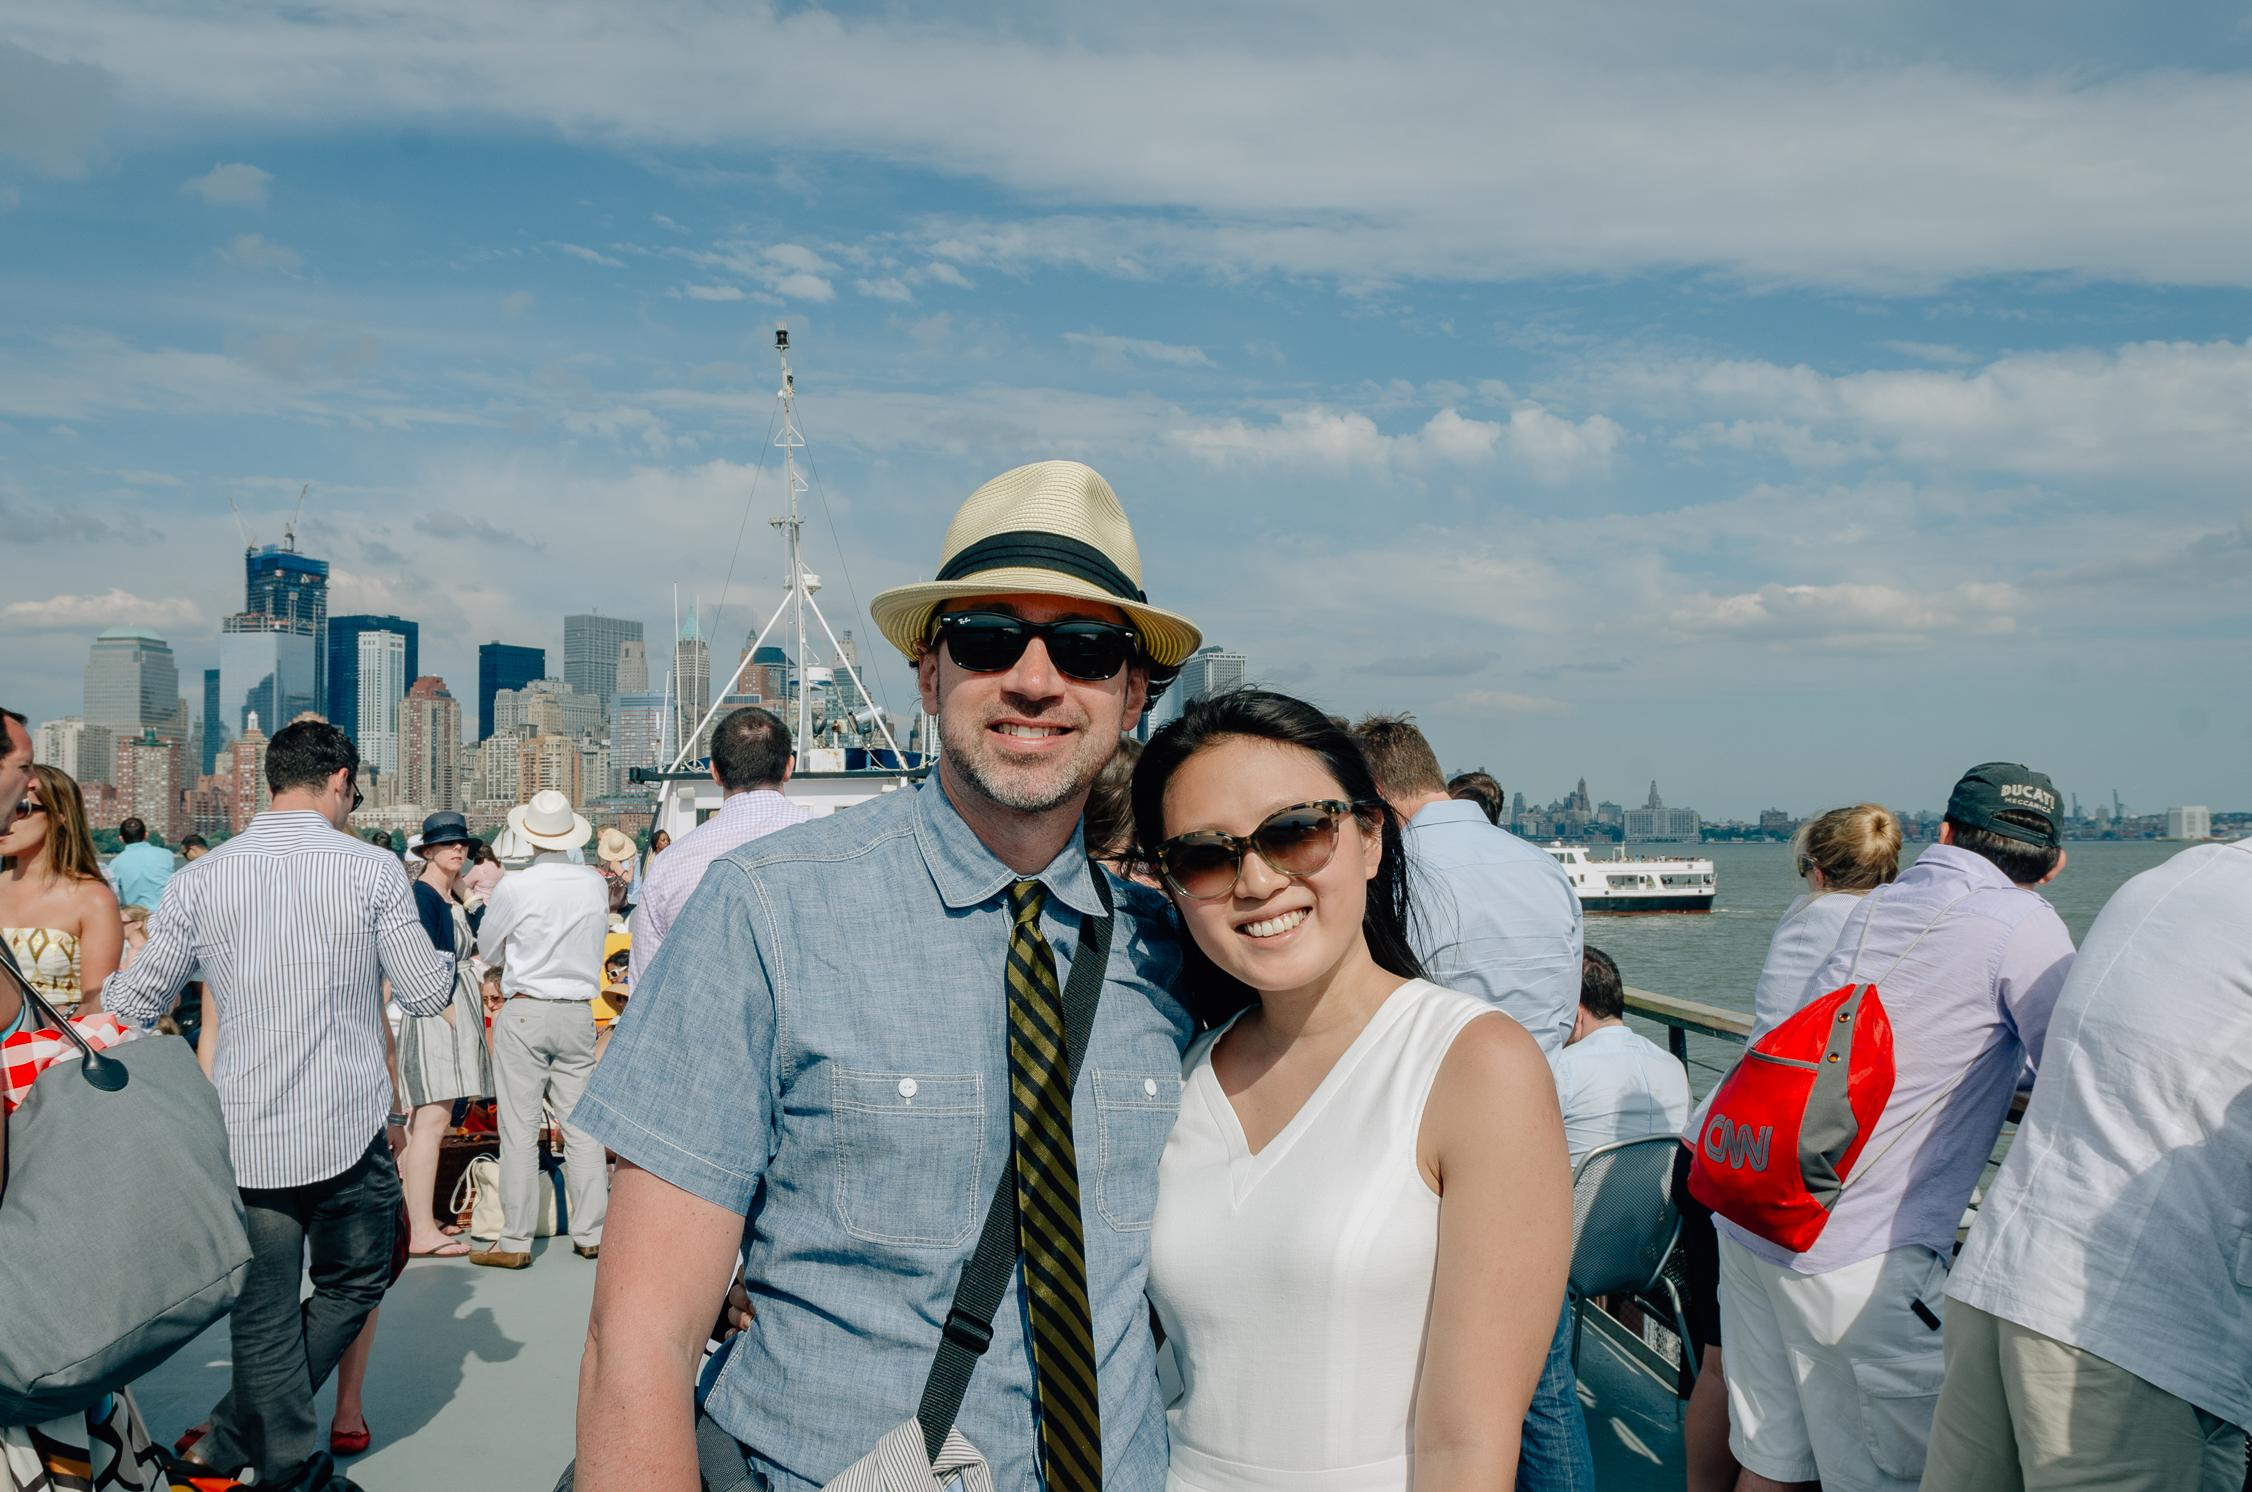 Liberty Island Polo Classic - 2012-0602-DSC_2813_22990